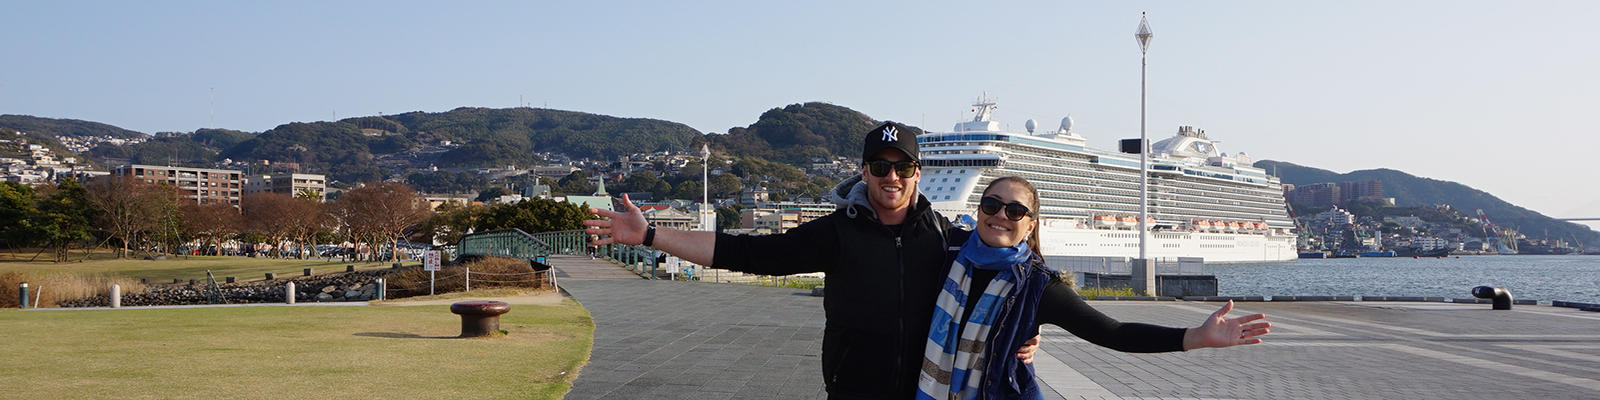 Majestic Princess cruise ship in dock